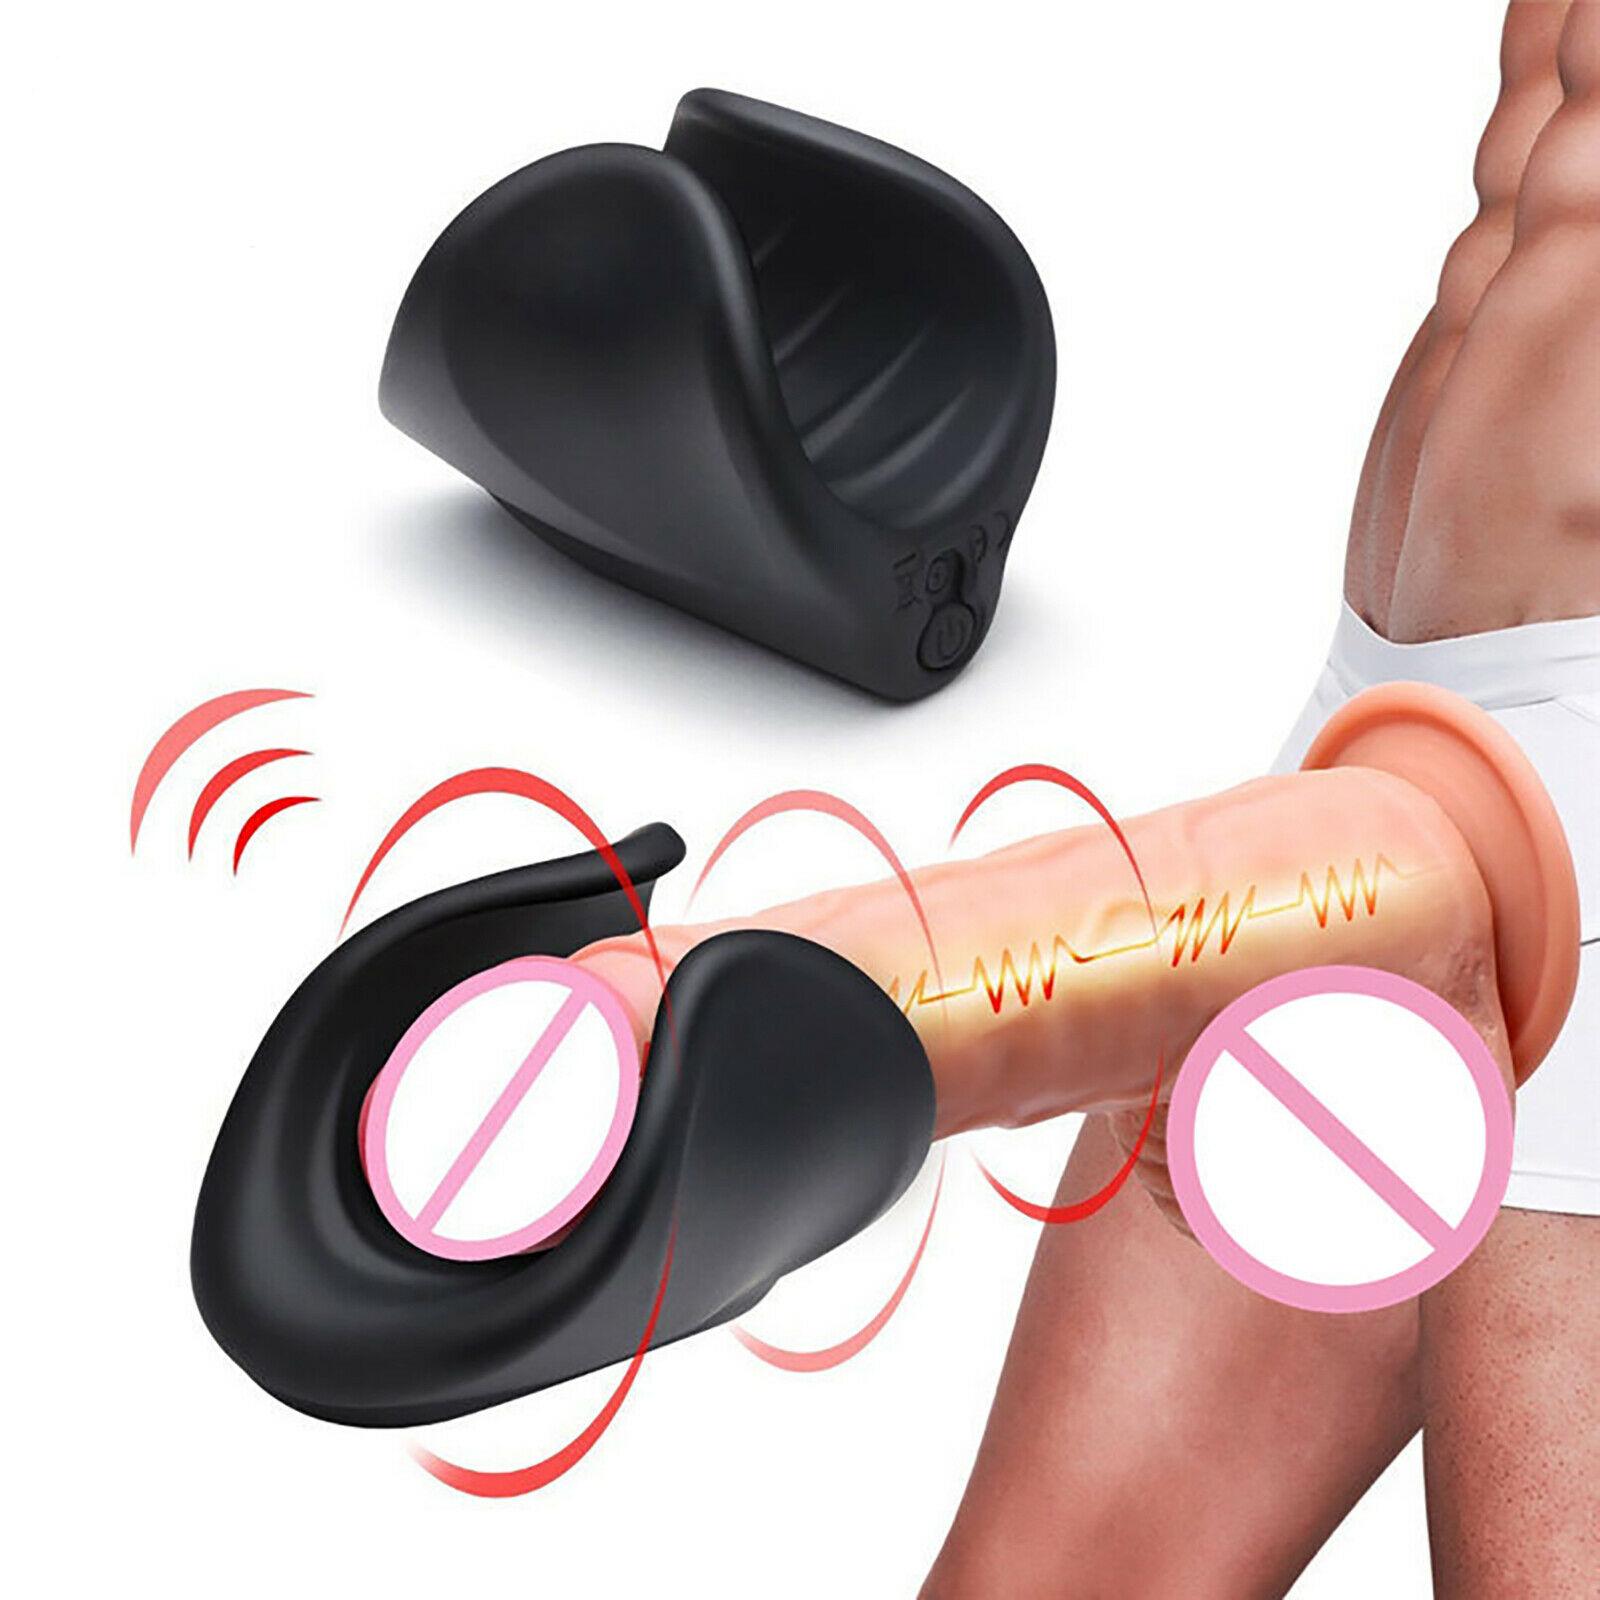 Male Masturbator 10 Speed Vibrator Penis Massager Silicone Adult Sex Toys